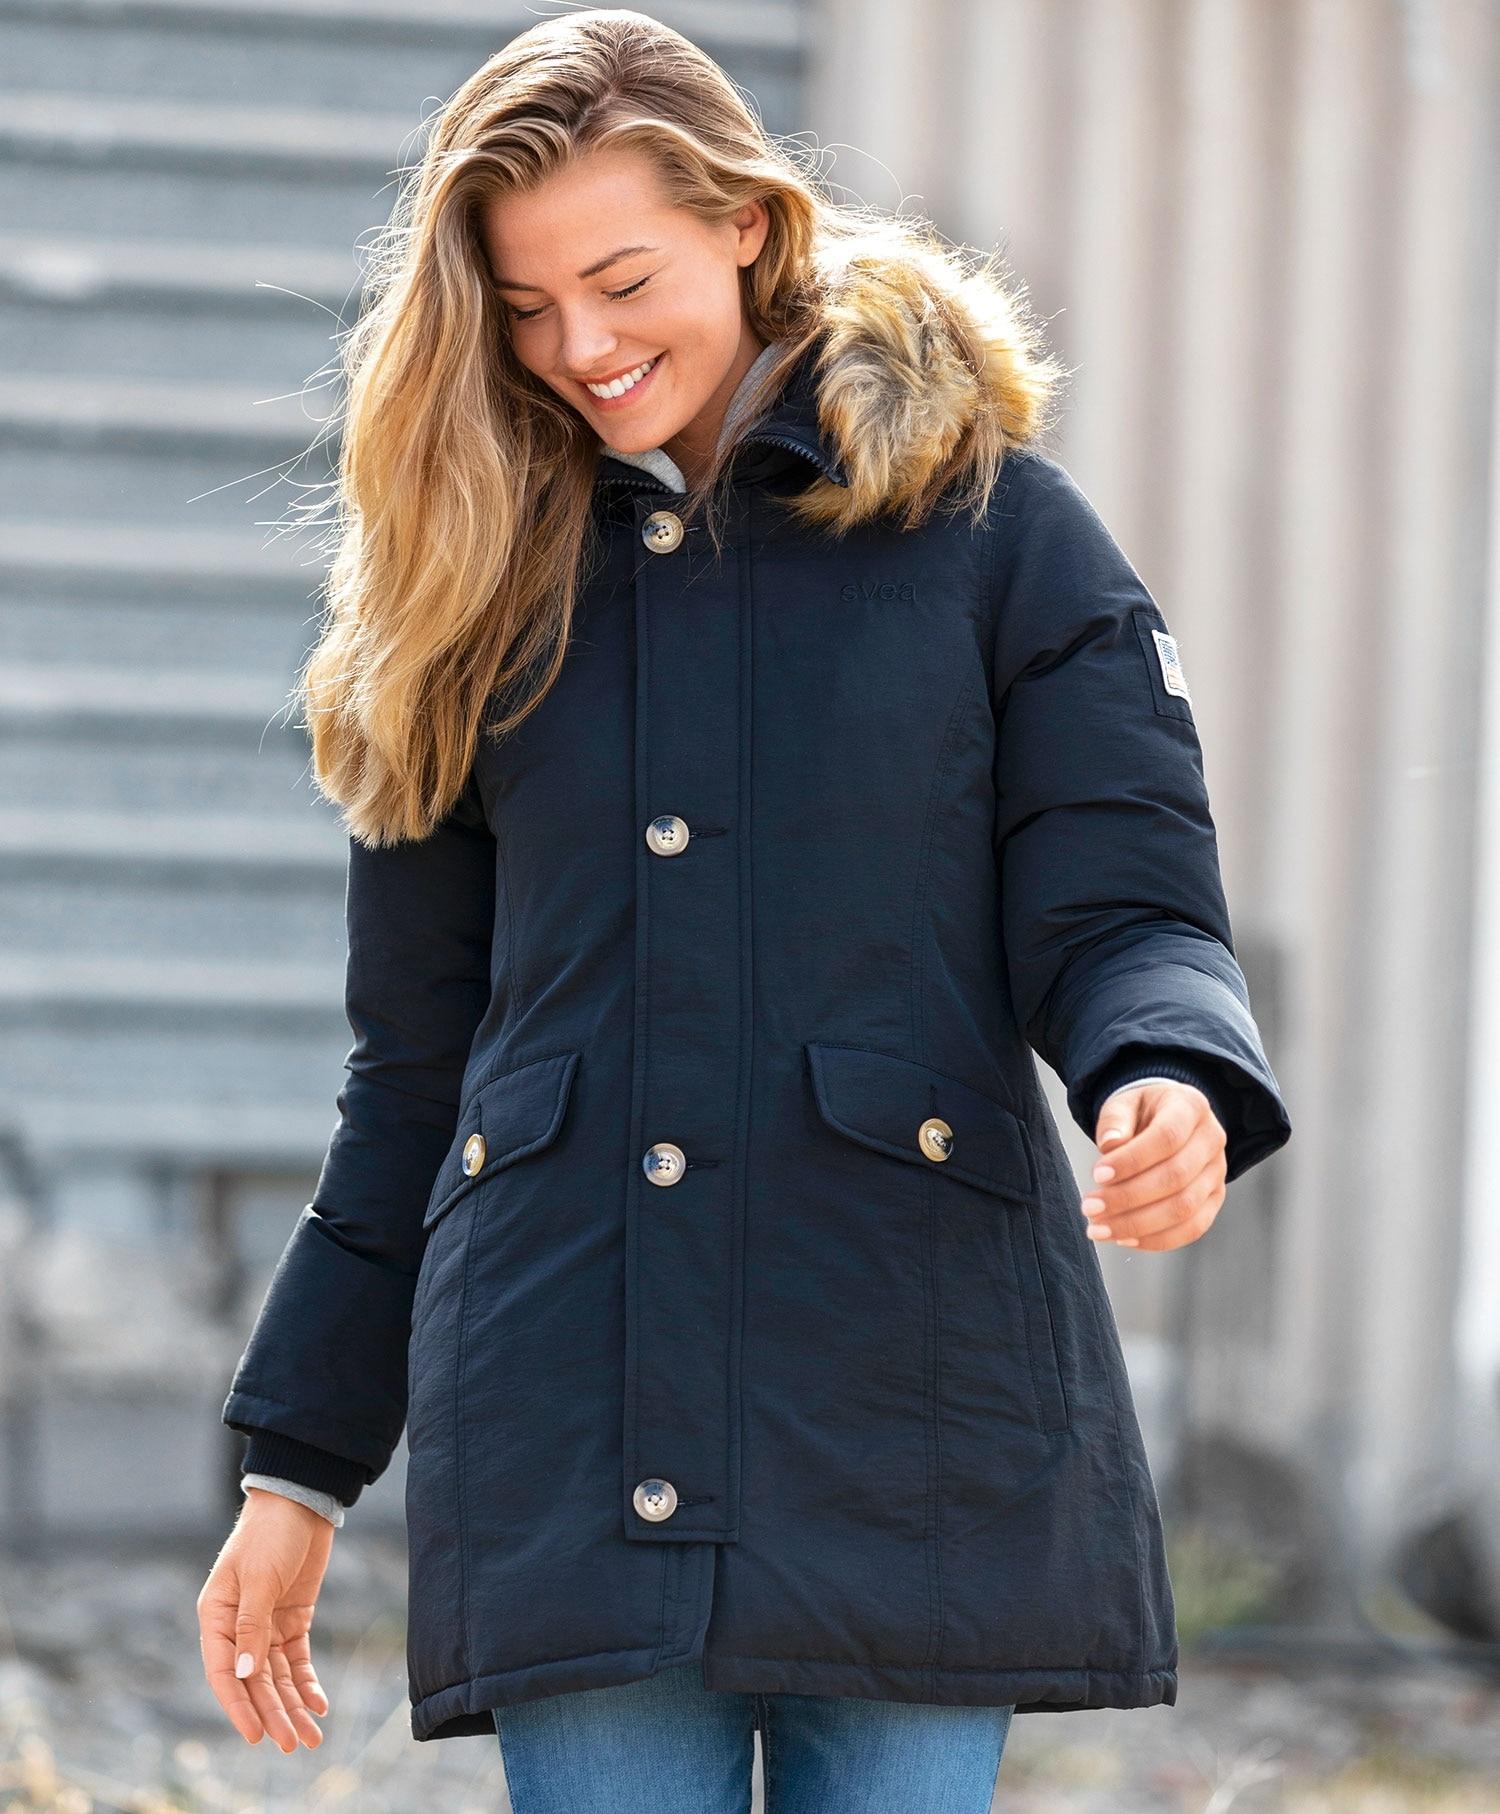 Svea Miss Smith jakke